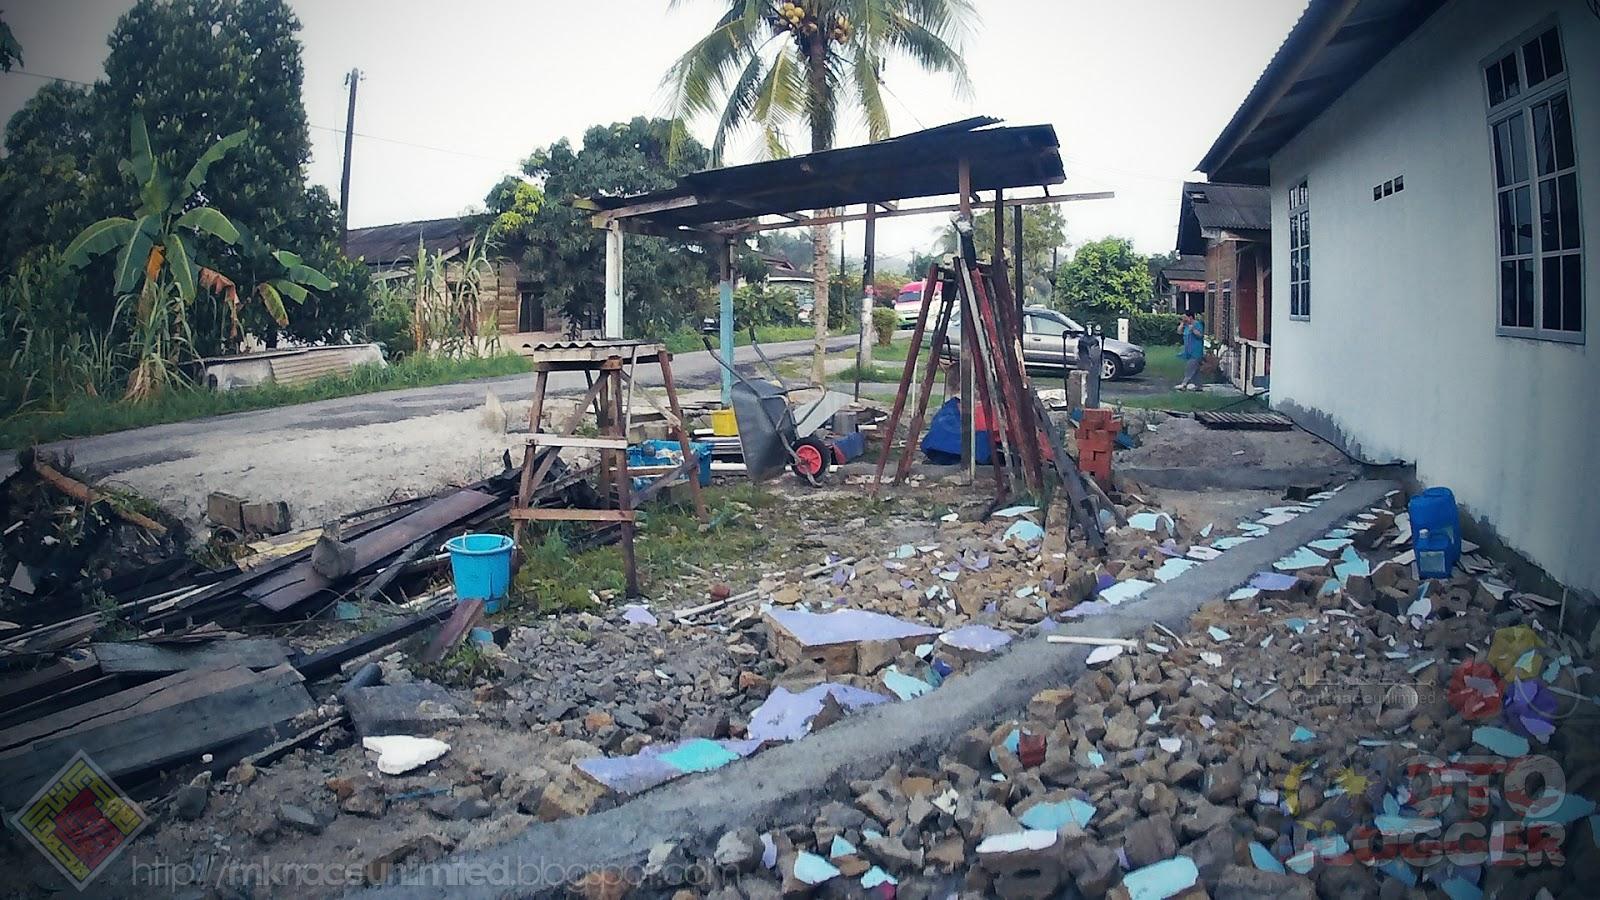 Home Sweet Renovation Phase 3 20181028 Progress Mknace Roti Tissue By Canai Ikhwan Gh Corner Mks Laluan Kereta Dah Mula Kelihatan